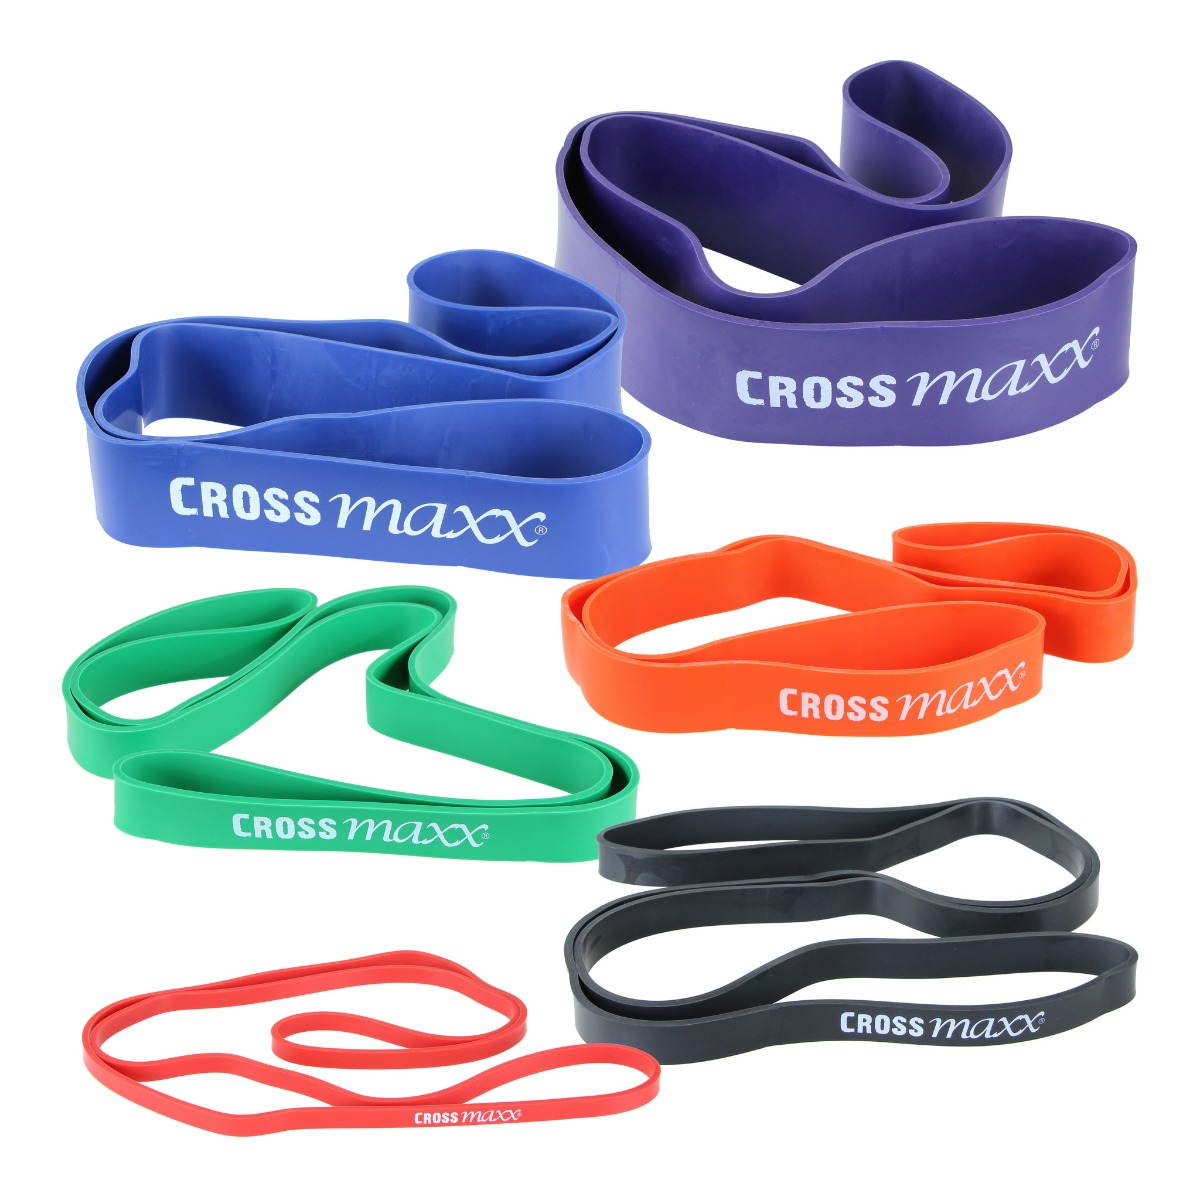 LMX Crossmaxx Weerstandsband 104 cm - Niveau 1 - Rood-498901